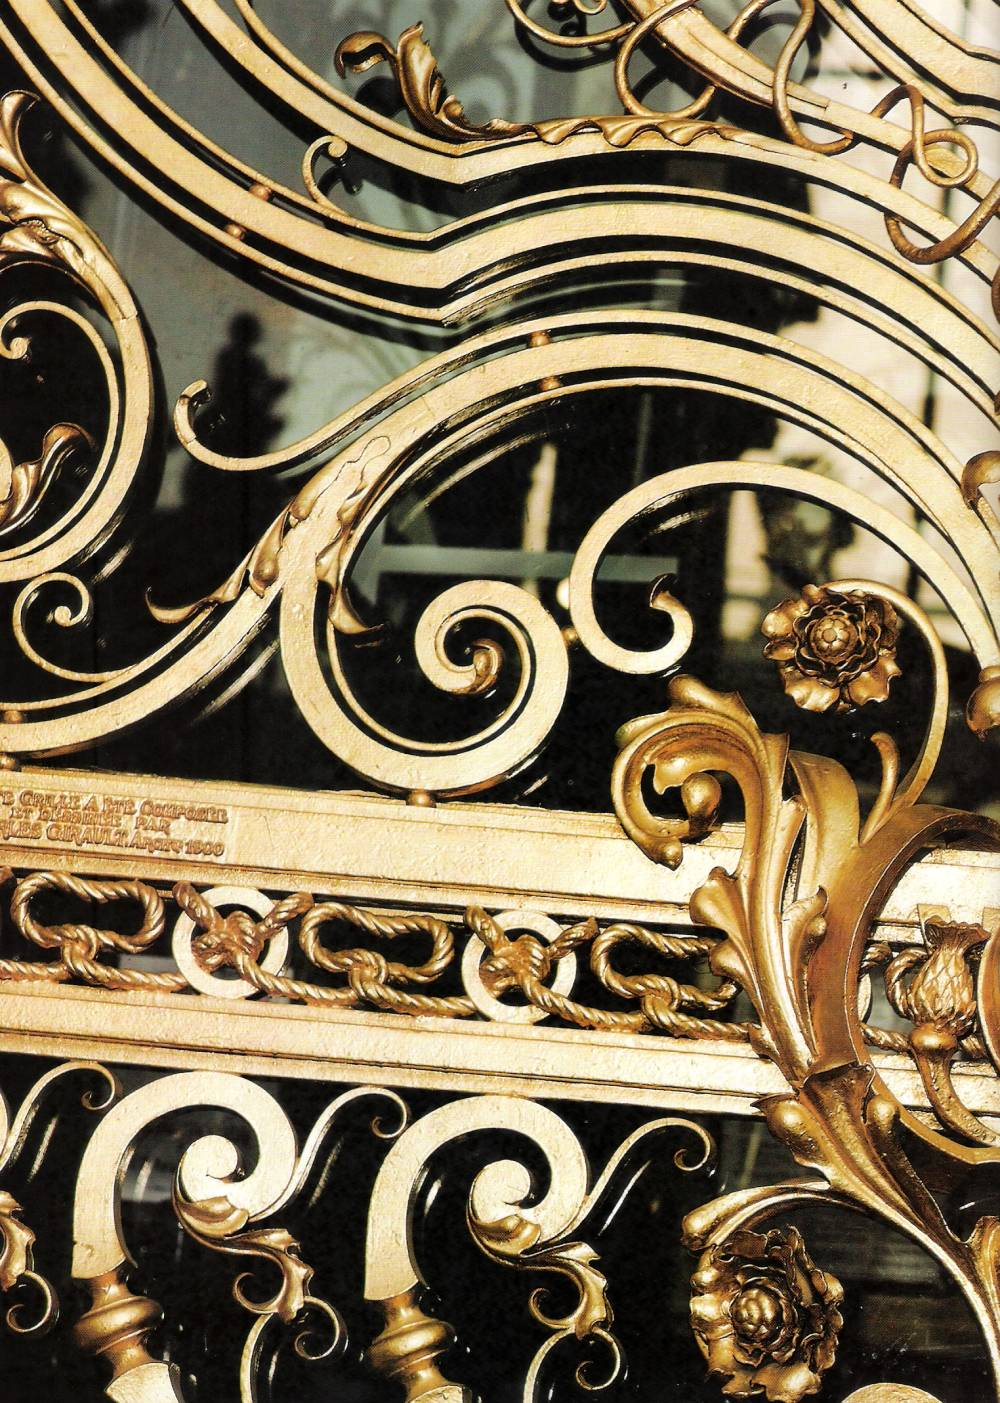 81834_MarieClaireBrazil_December2008_phSachaHochstetter_14_122_417lo.jpg